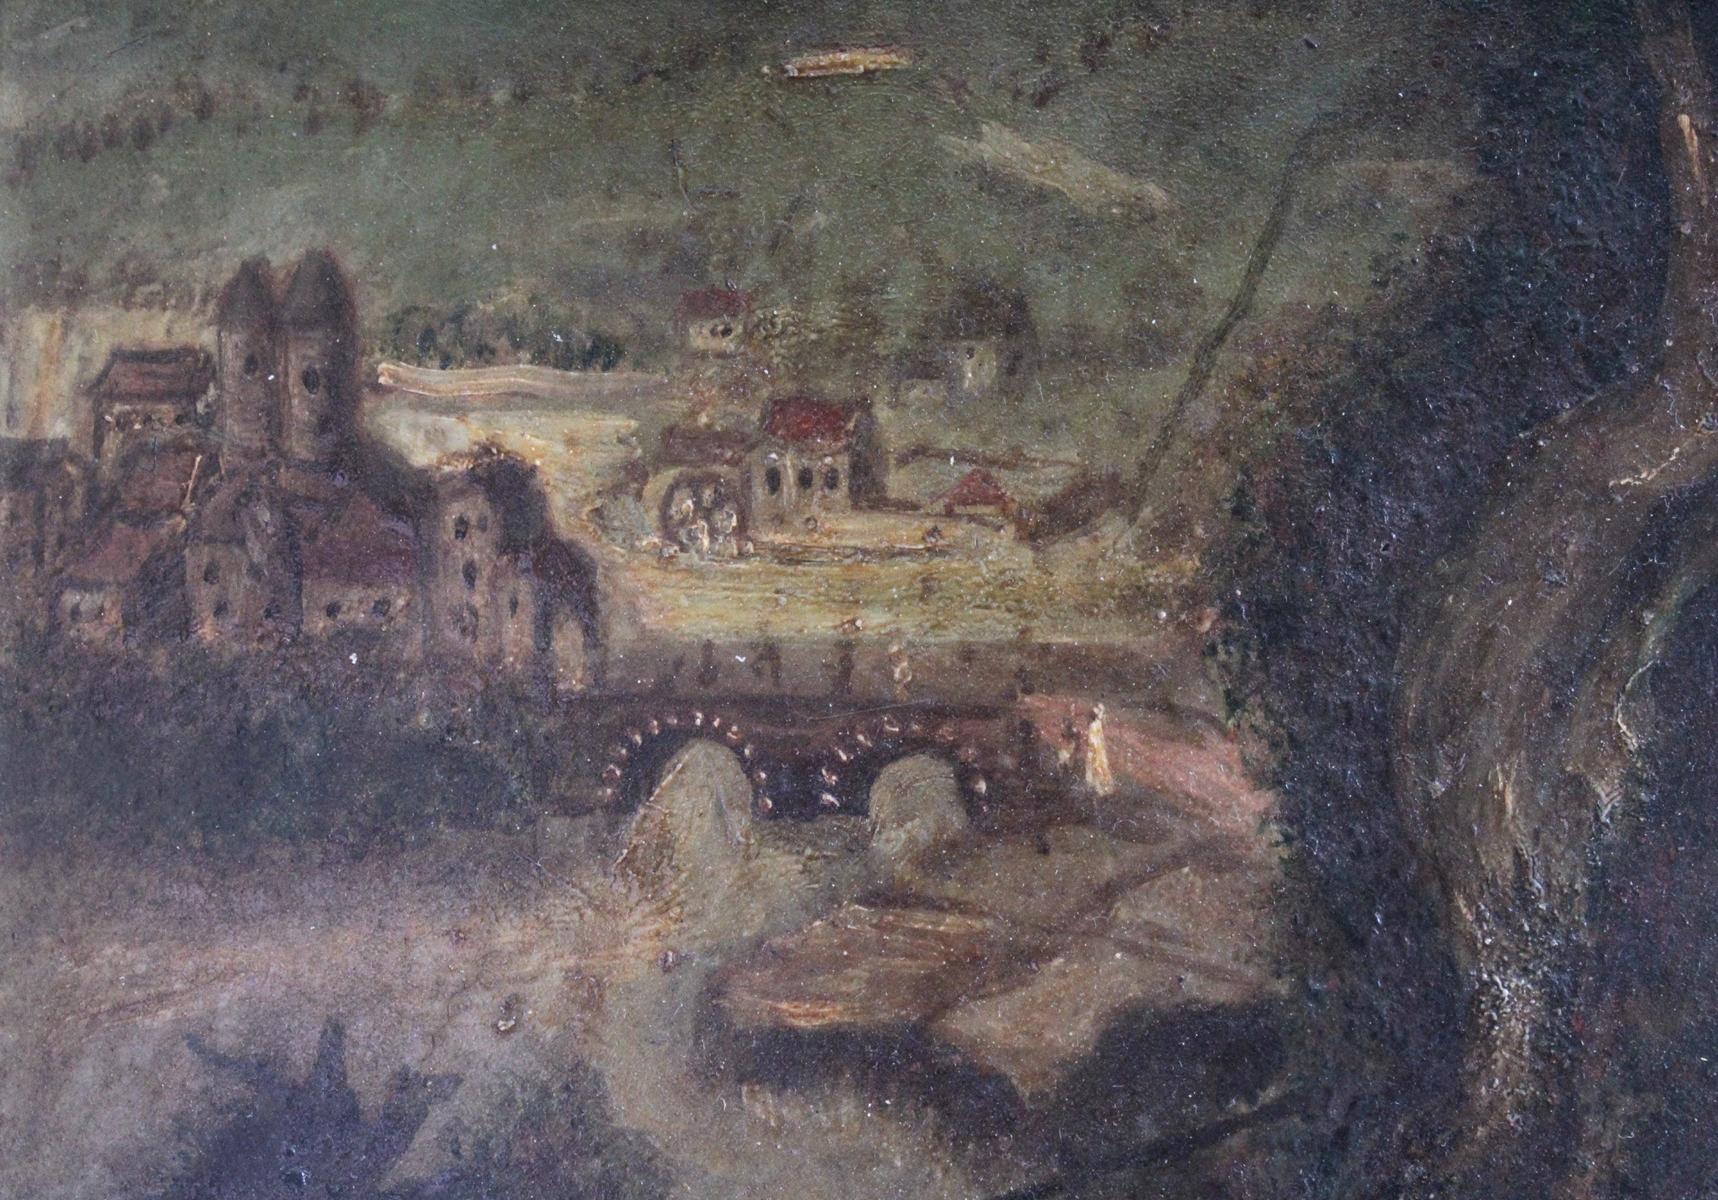 Religiöses Gemälde, 19. Jahrhundert. Unbekannter Künstler-5